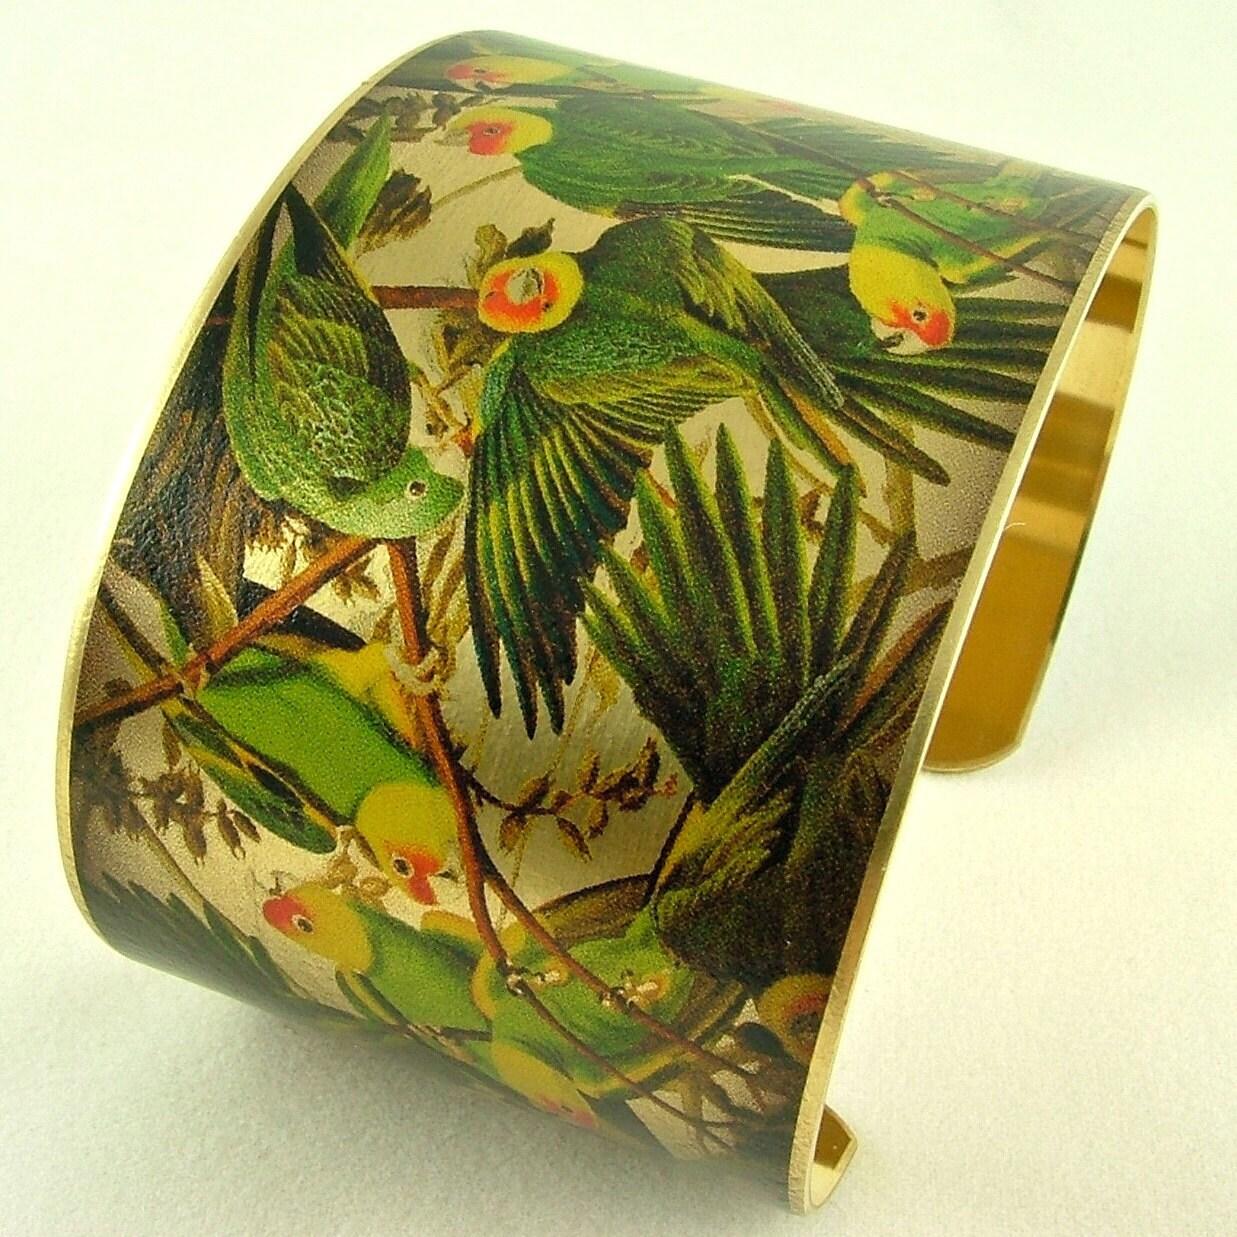 Audubon's Parrot Bird Brass Cuff Bracelet - Ornithology The Extinct Carolina Parakeet - Black Friday Etsy Cyber Monday Etsy